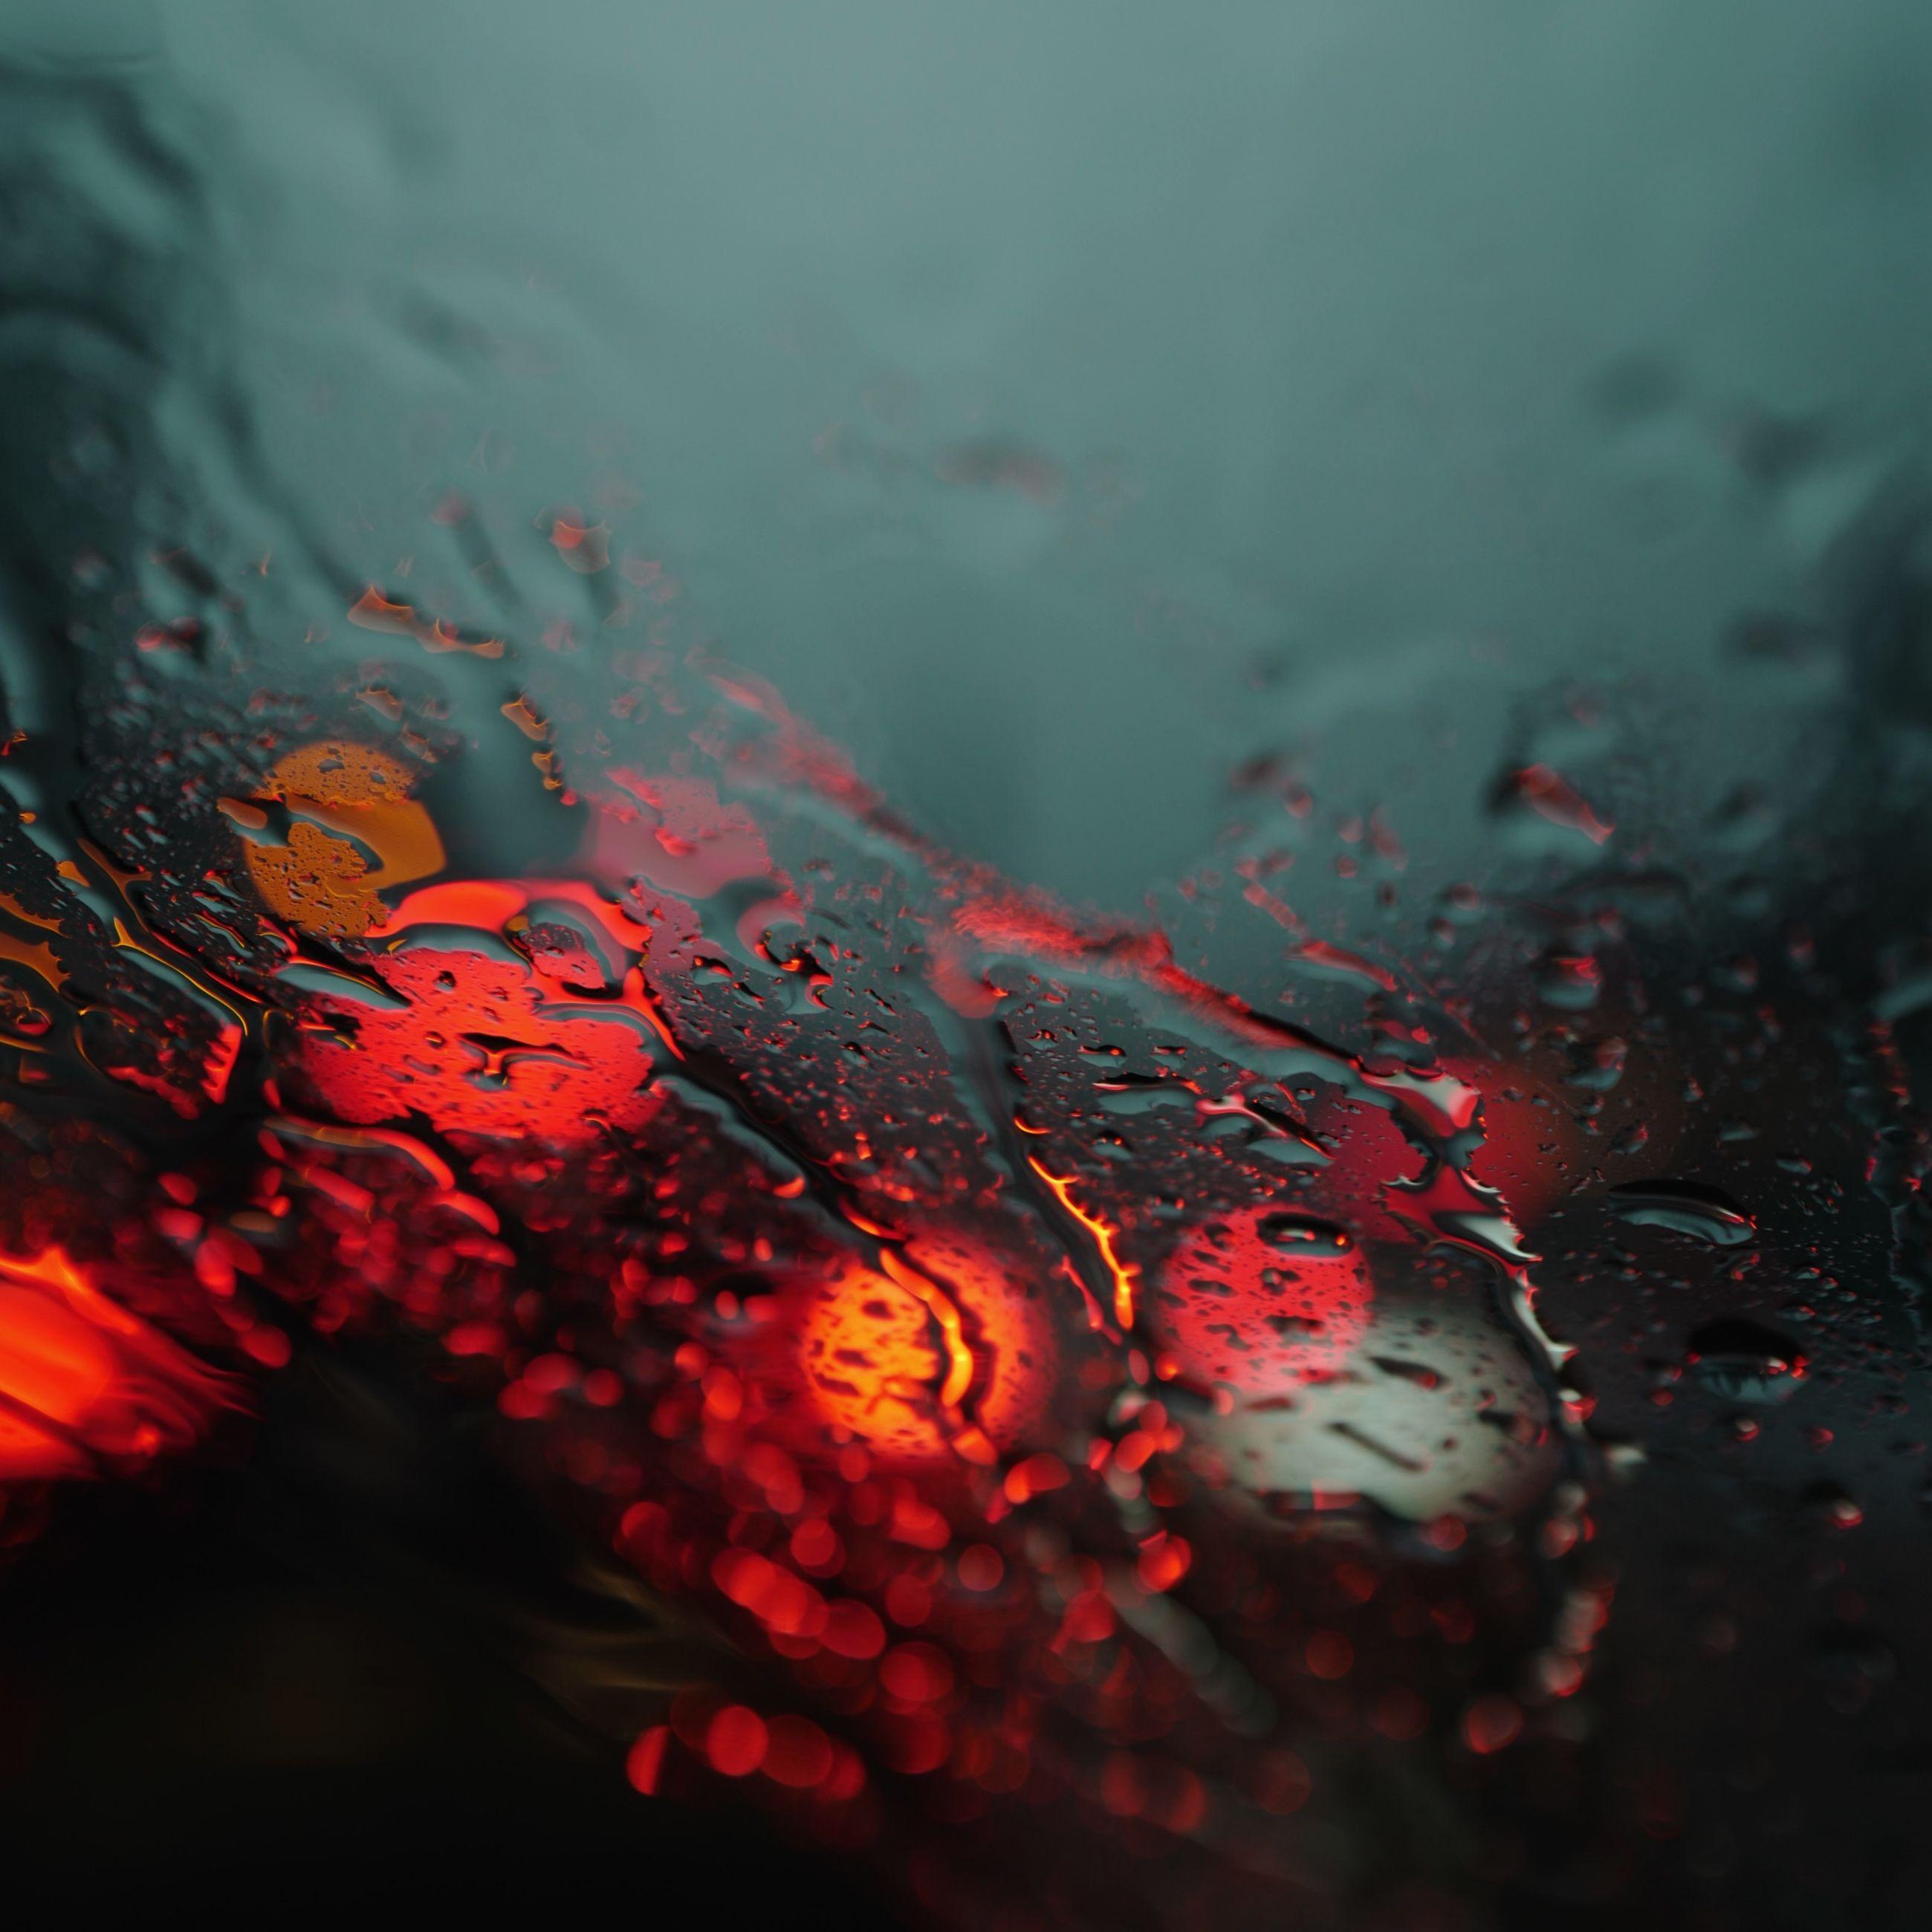 wet, red, nature, close-up, selective focus, no people, water, drop, rain, plant, outdoors, day, leaf, plant part, rainy season, motion, orange color, tree, raindrop, change